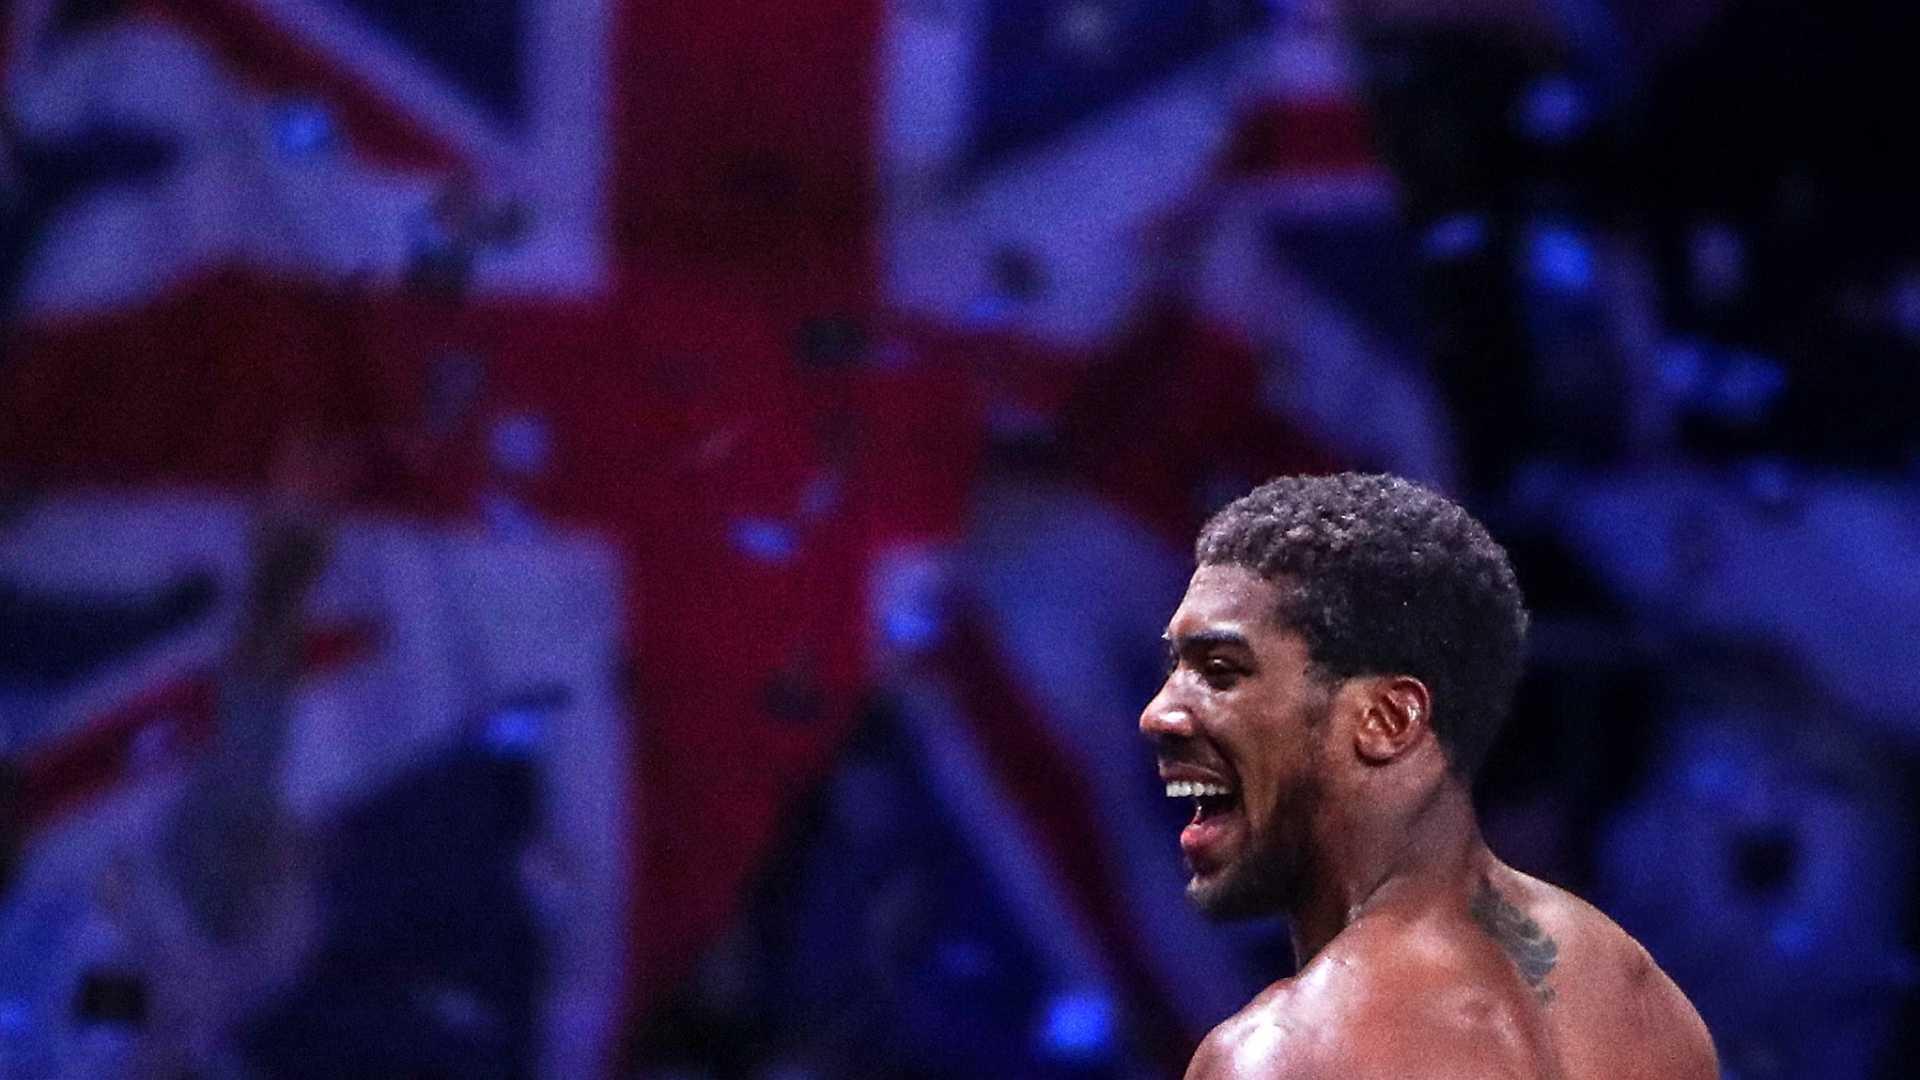 British boxer Anthony Joshua celebrates winning a bout against his American rival Andy Ruiz Jr and regaining his IBO, WBA Super, IBF and WBO World Heavy Titles at Diriyah Arena outside Riyadh